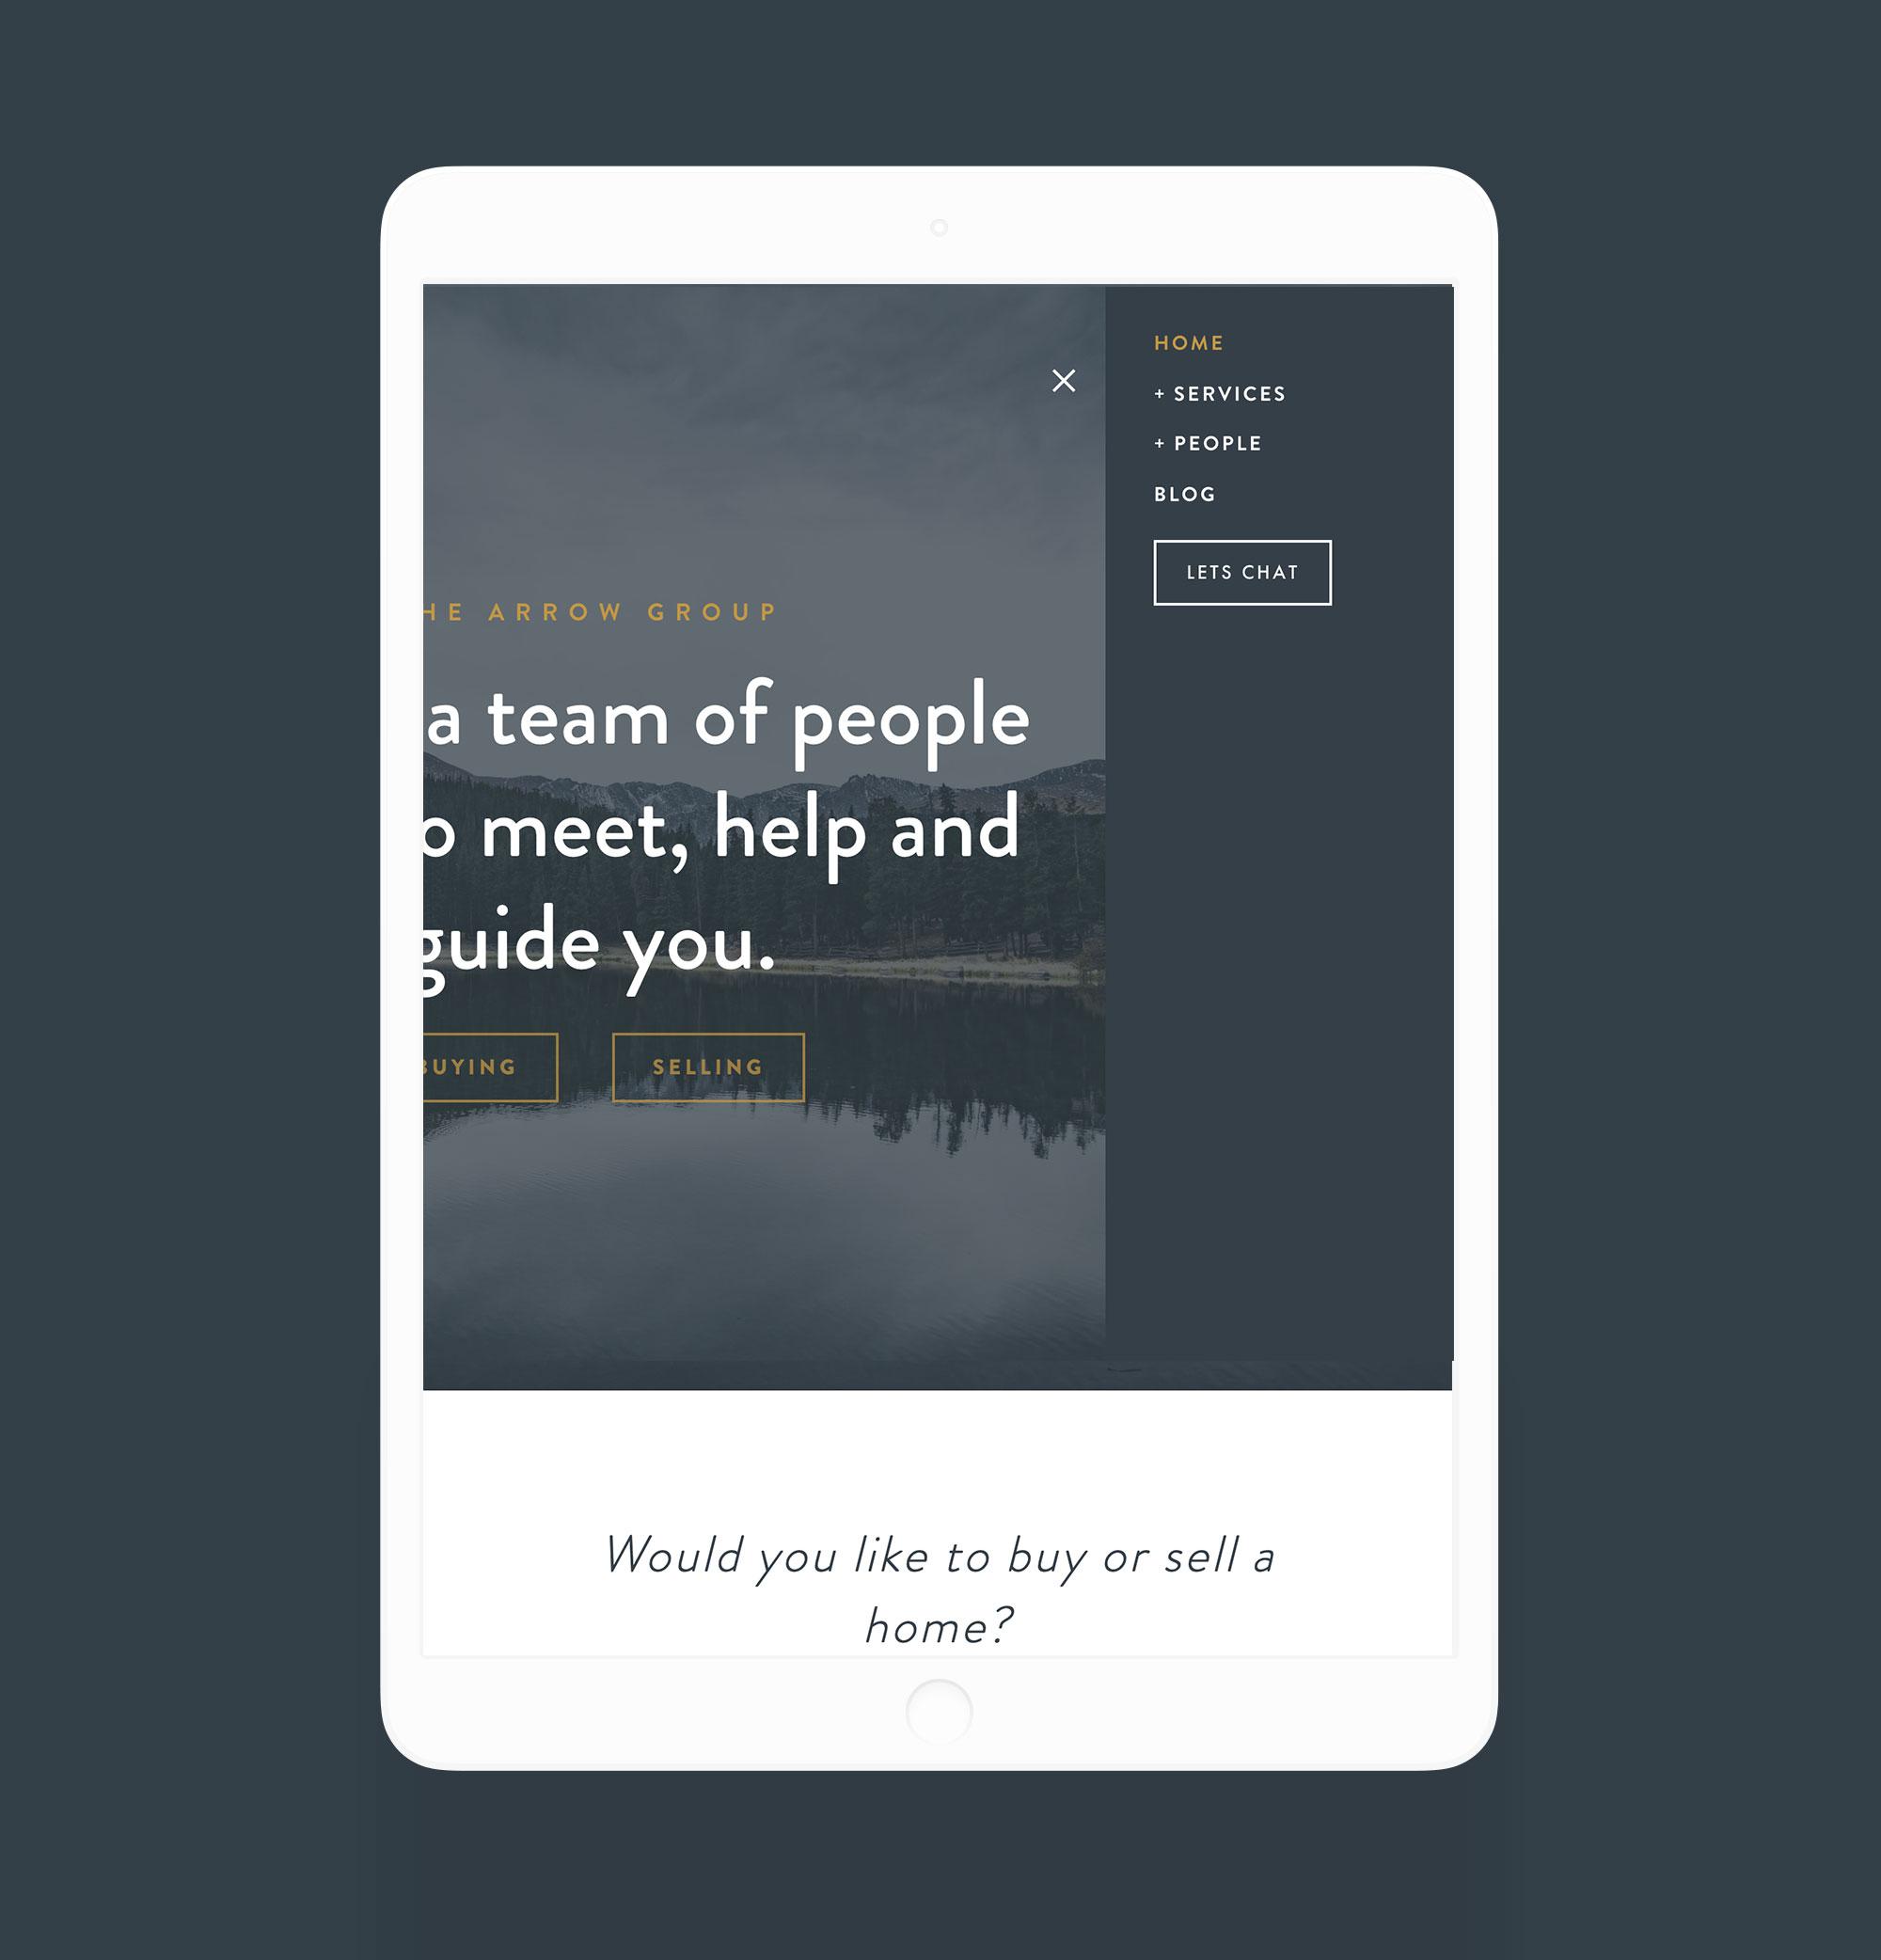 arrow-group-web-iPad-menu.jpg